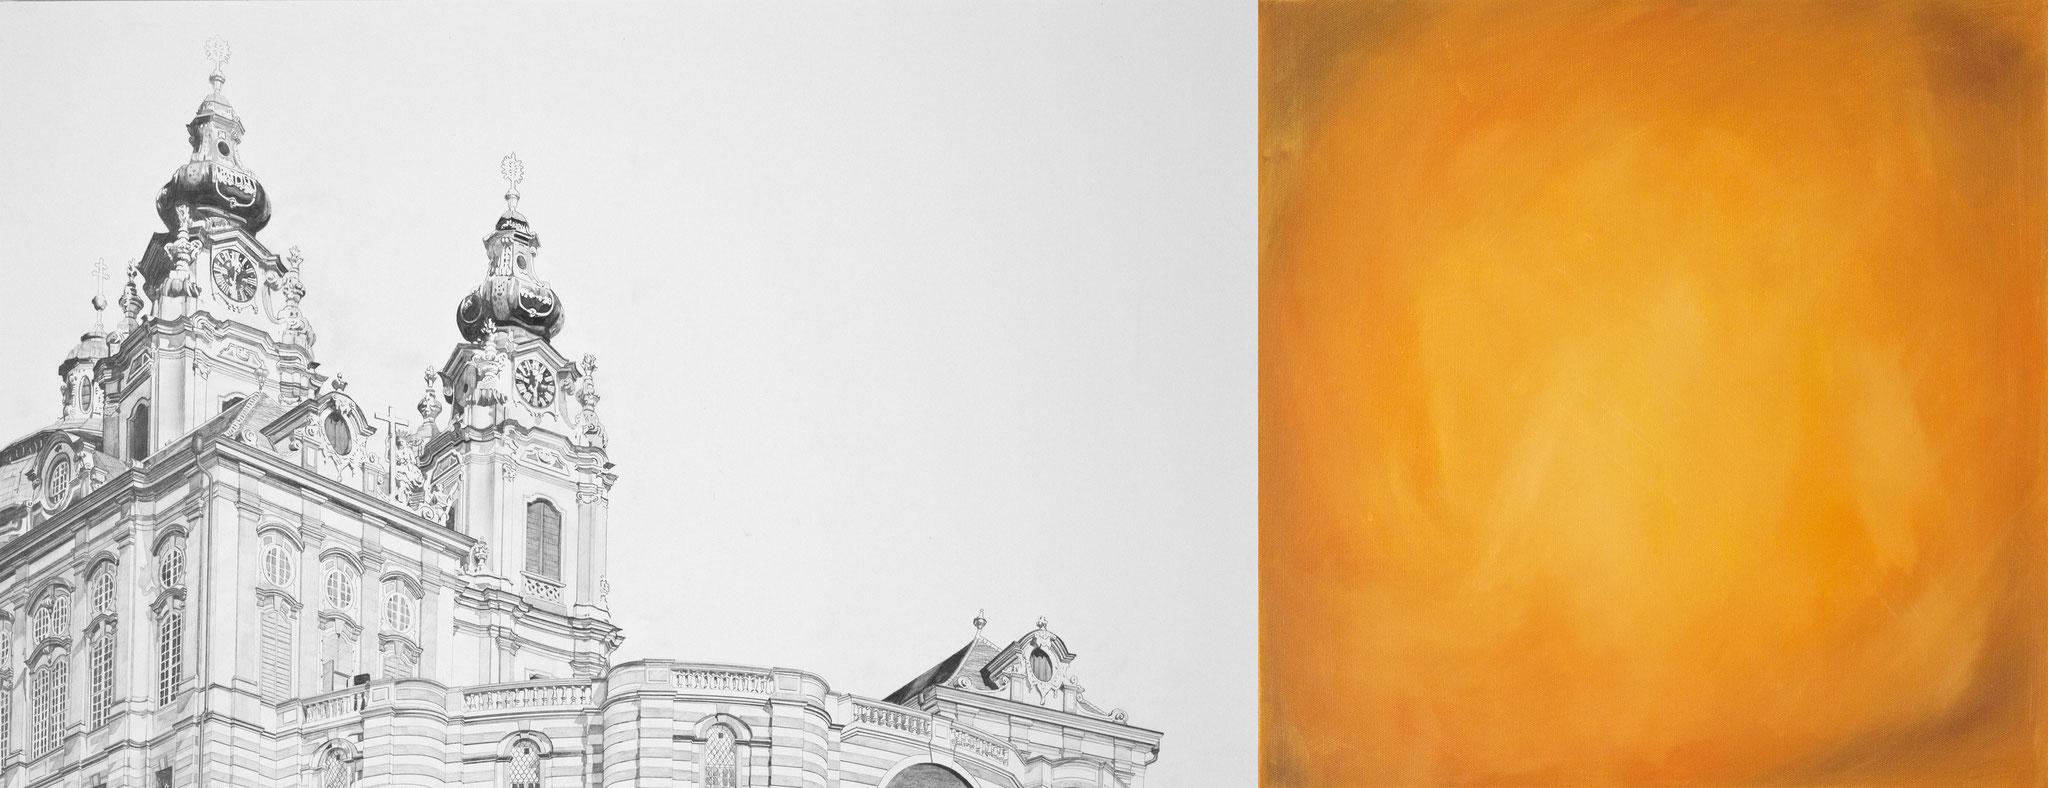 ›Stift Melk‹, Bleistift, Acryl auf Leinwand, 130 x 50 cm, 2015